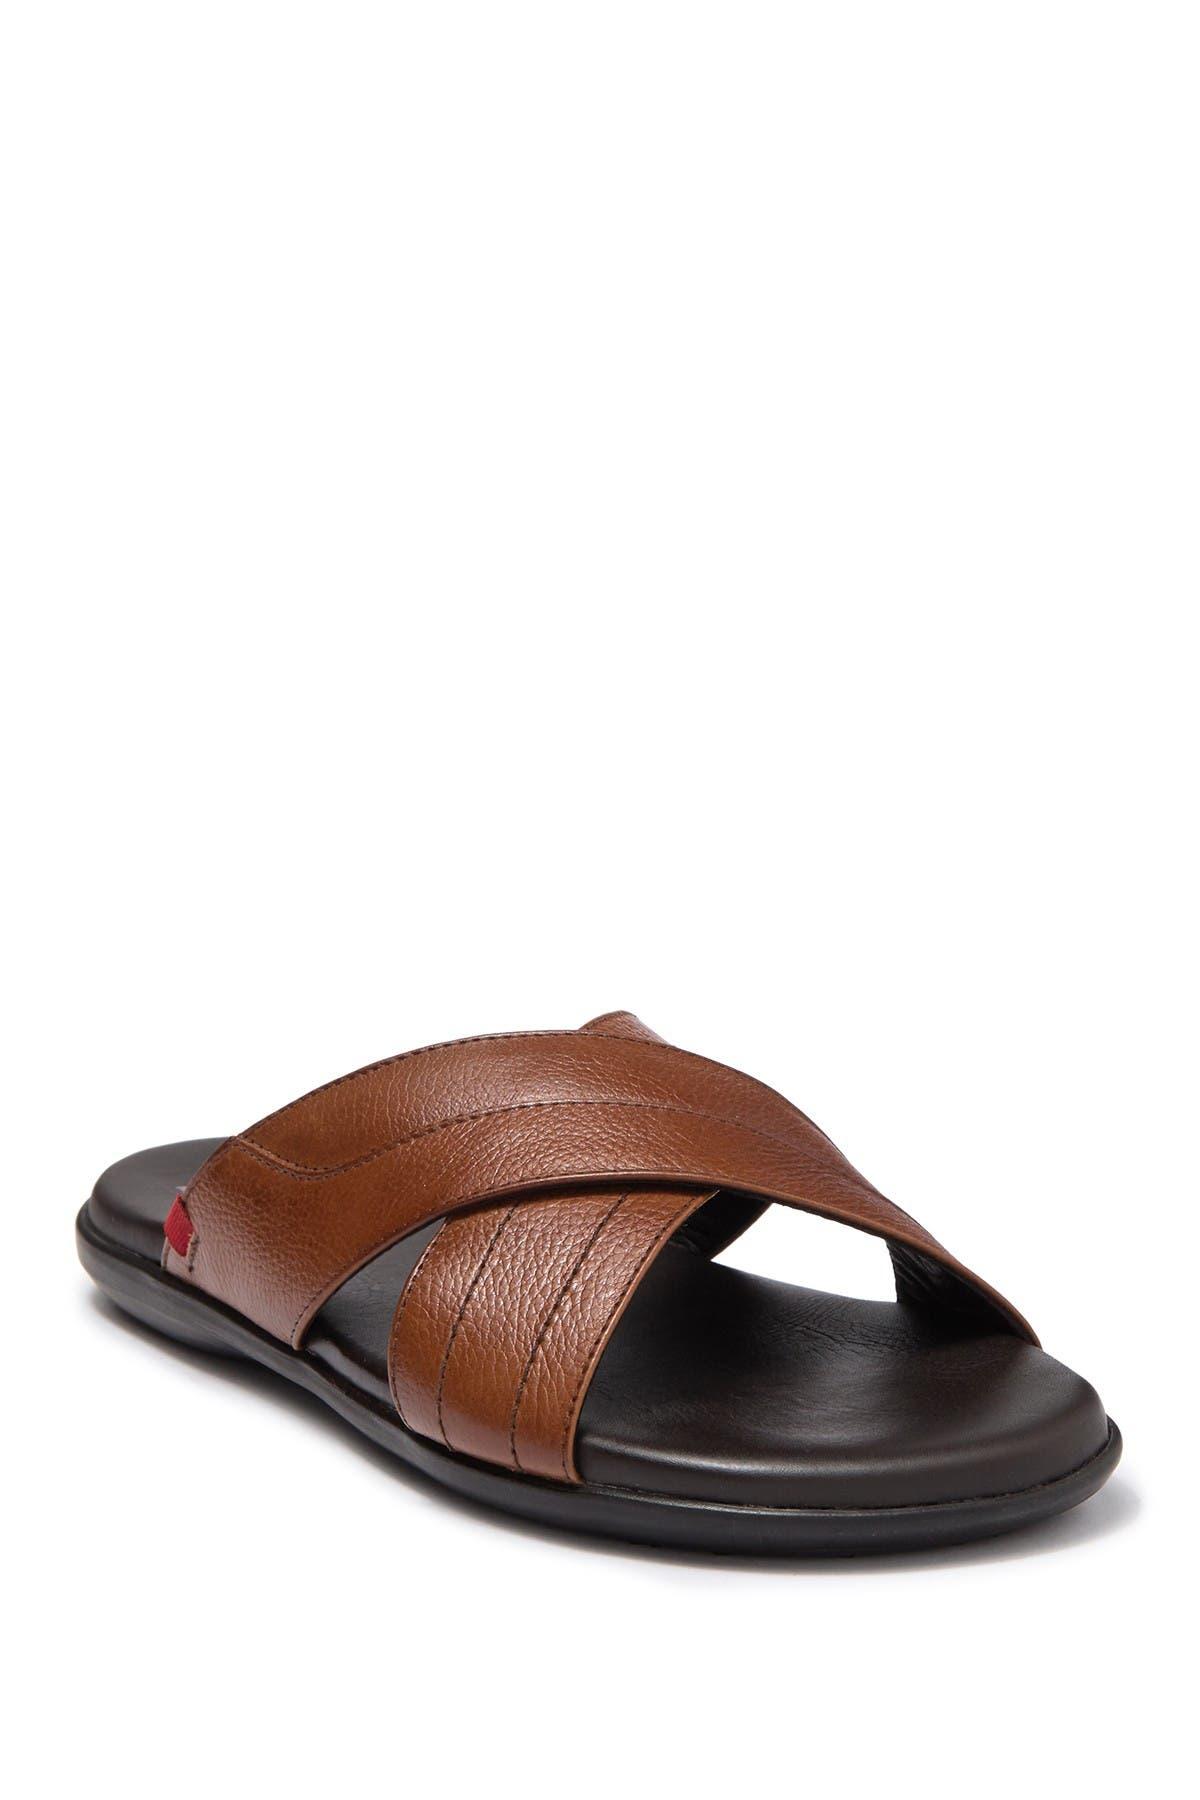 Image of Marc Joseph New York Claremont Leather Sandal